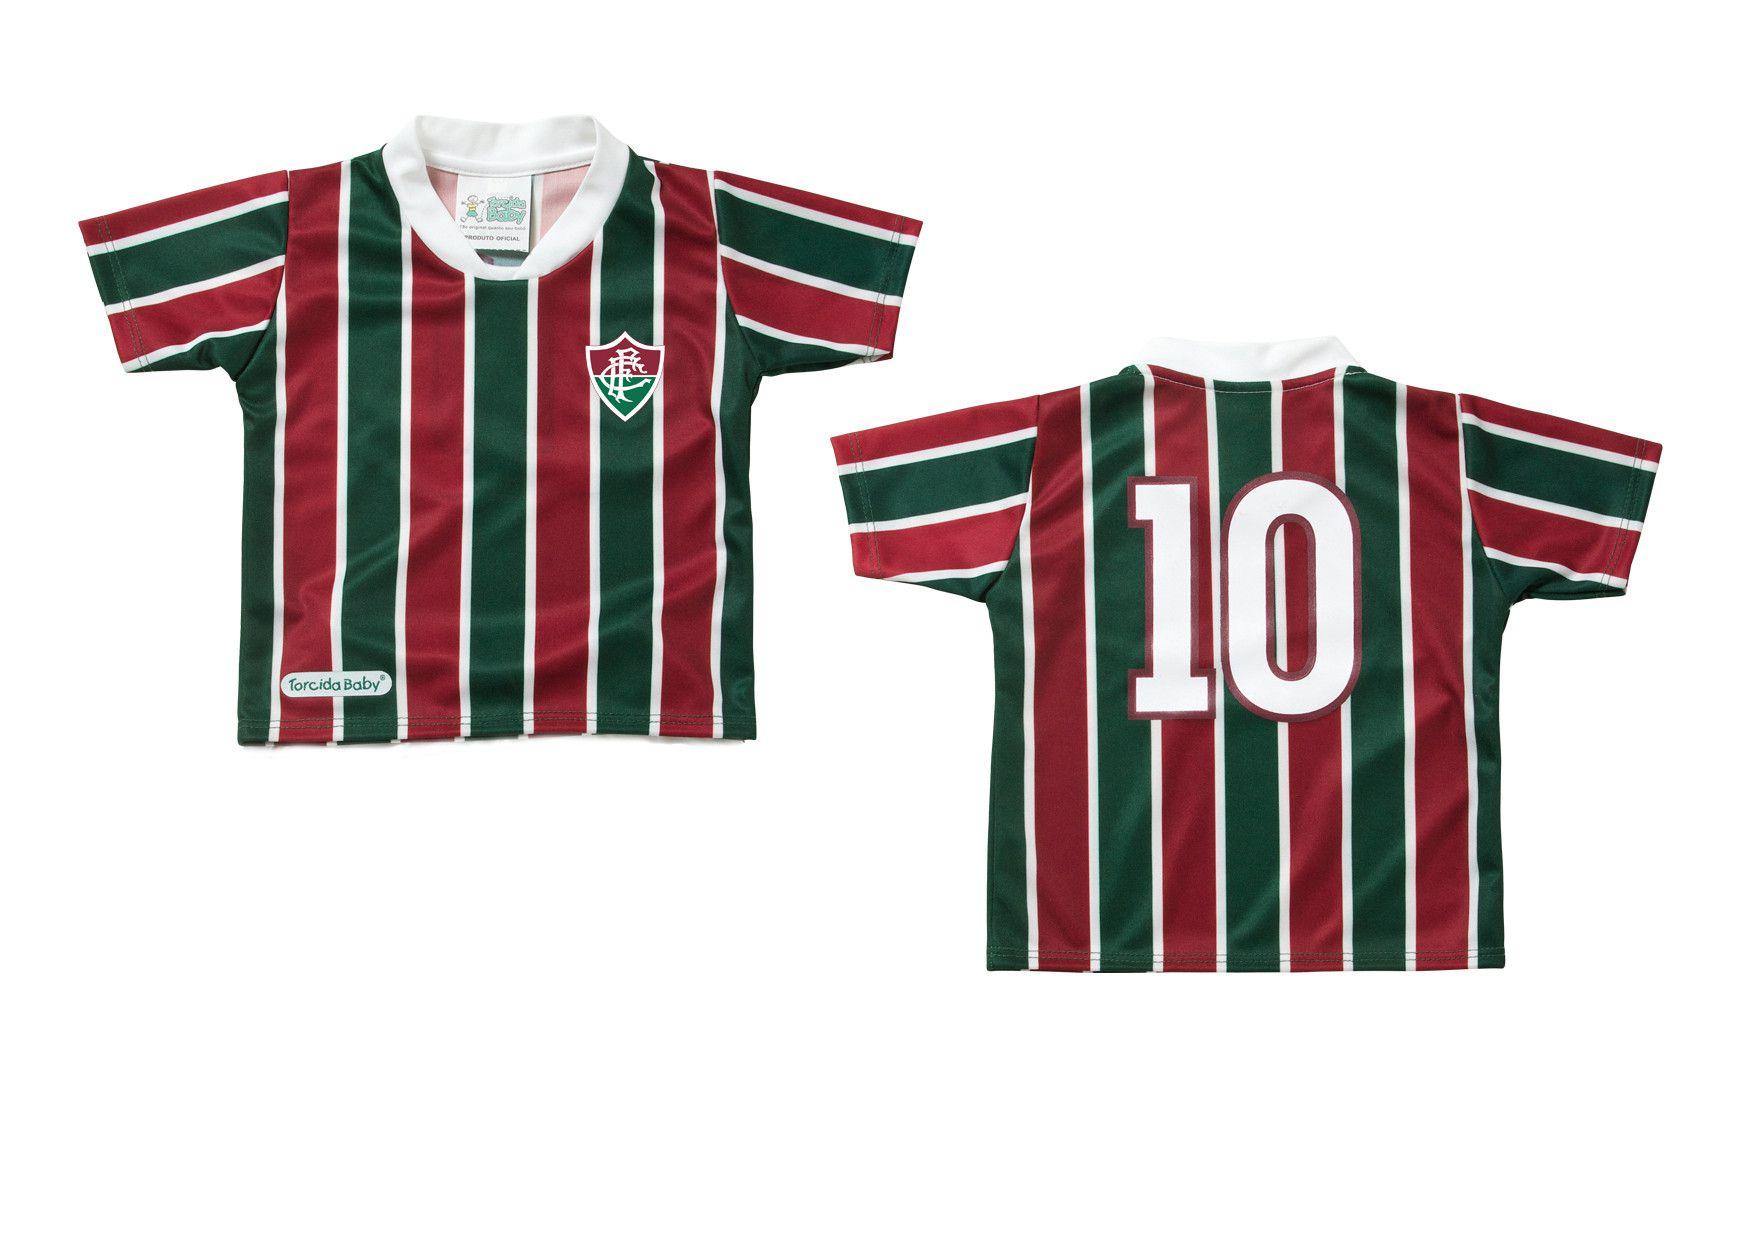 Camisa Fluminense Torcida Baby Tricolor